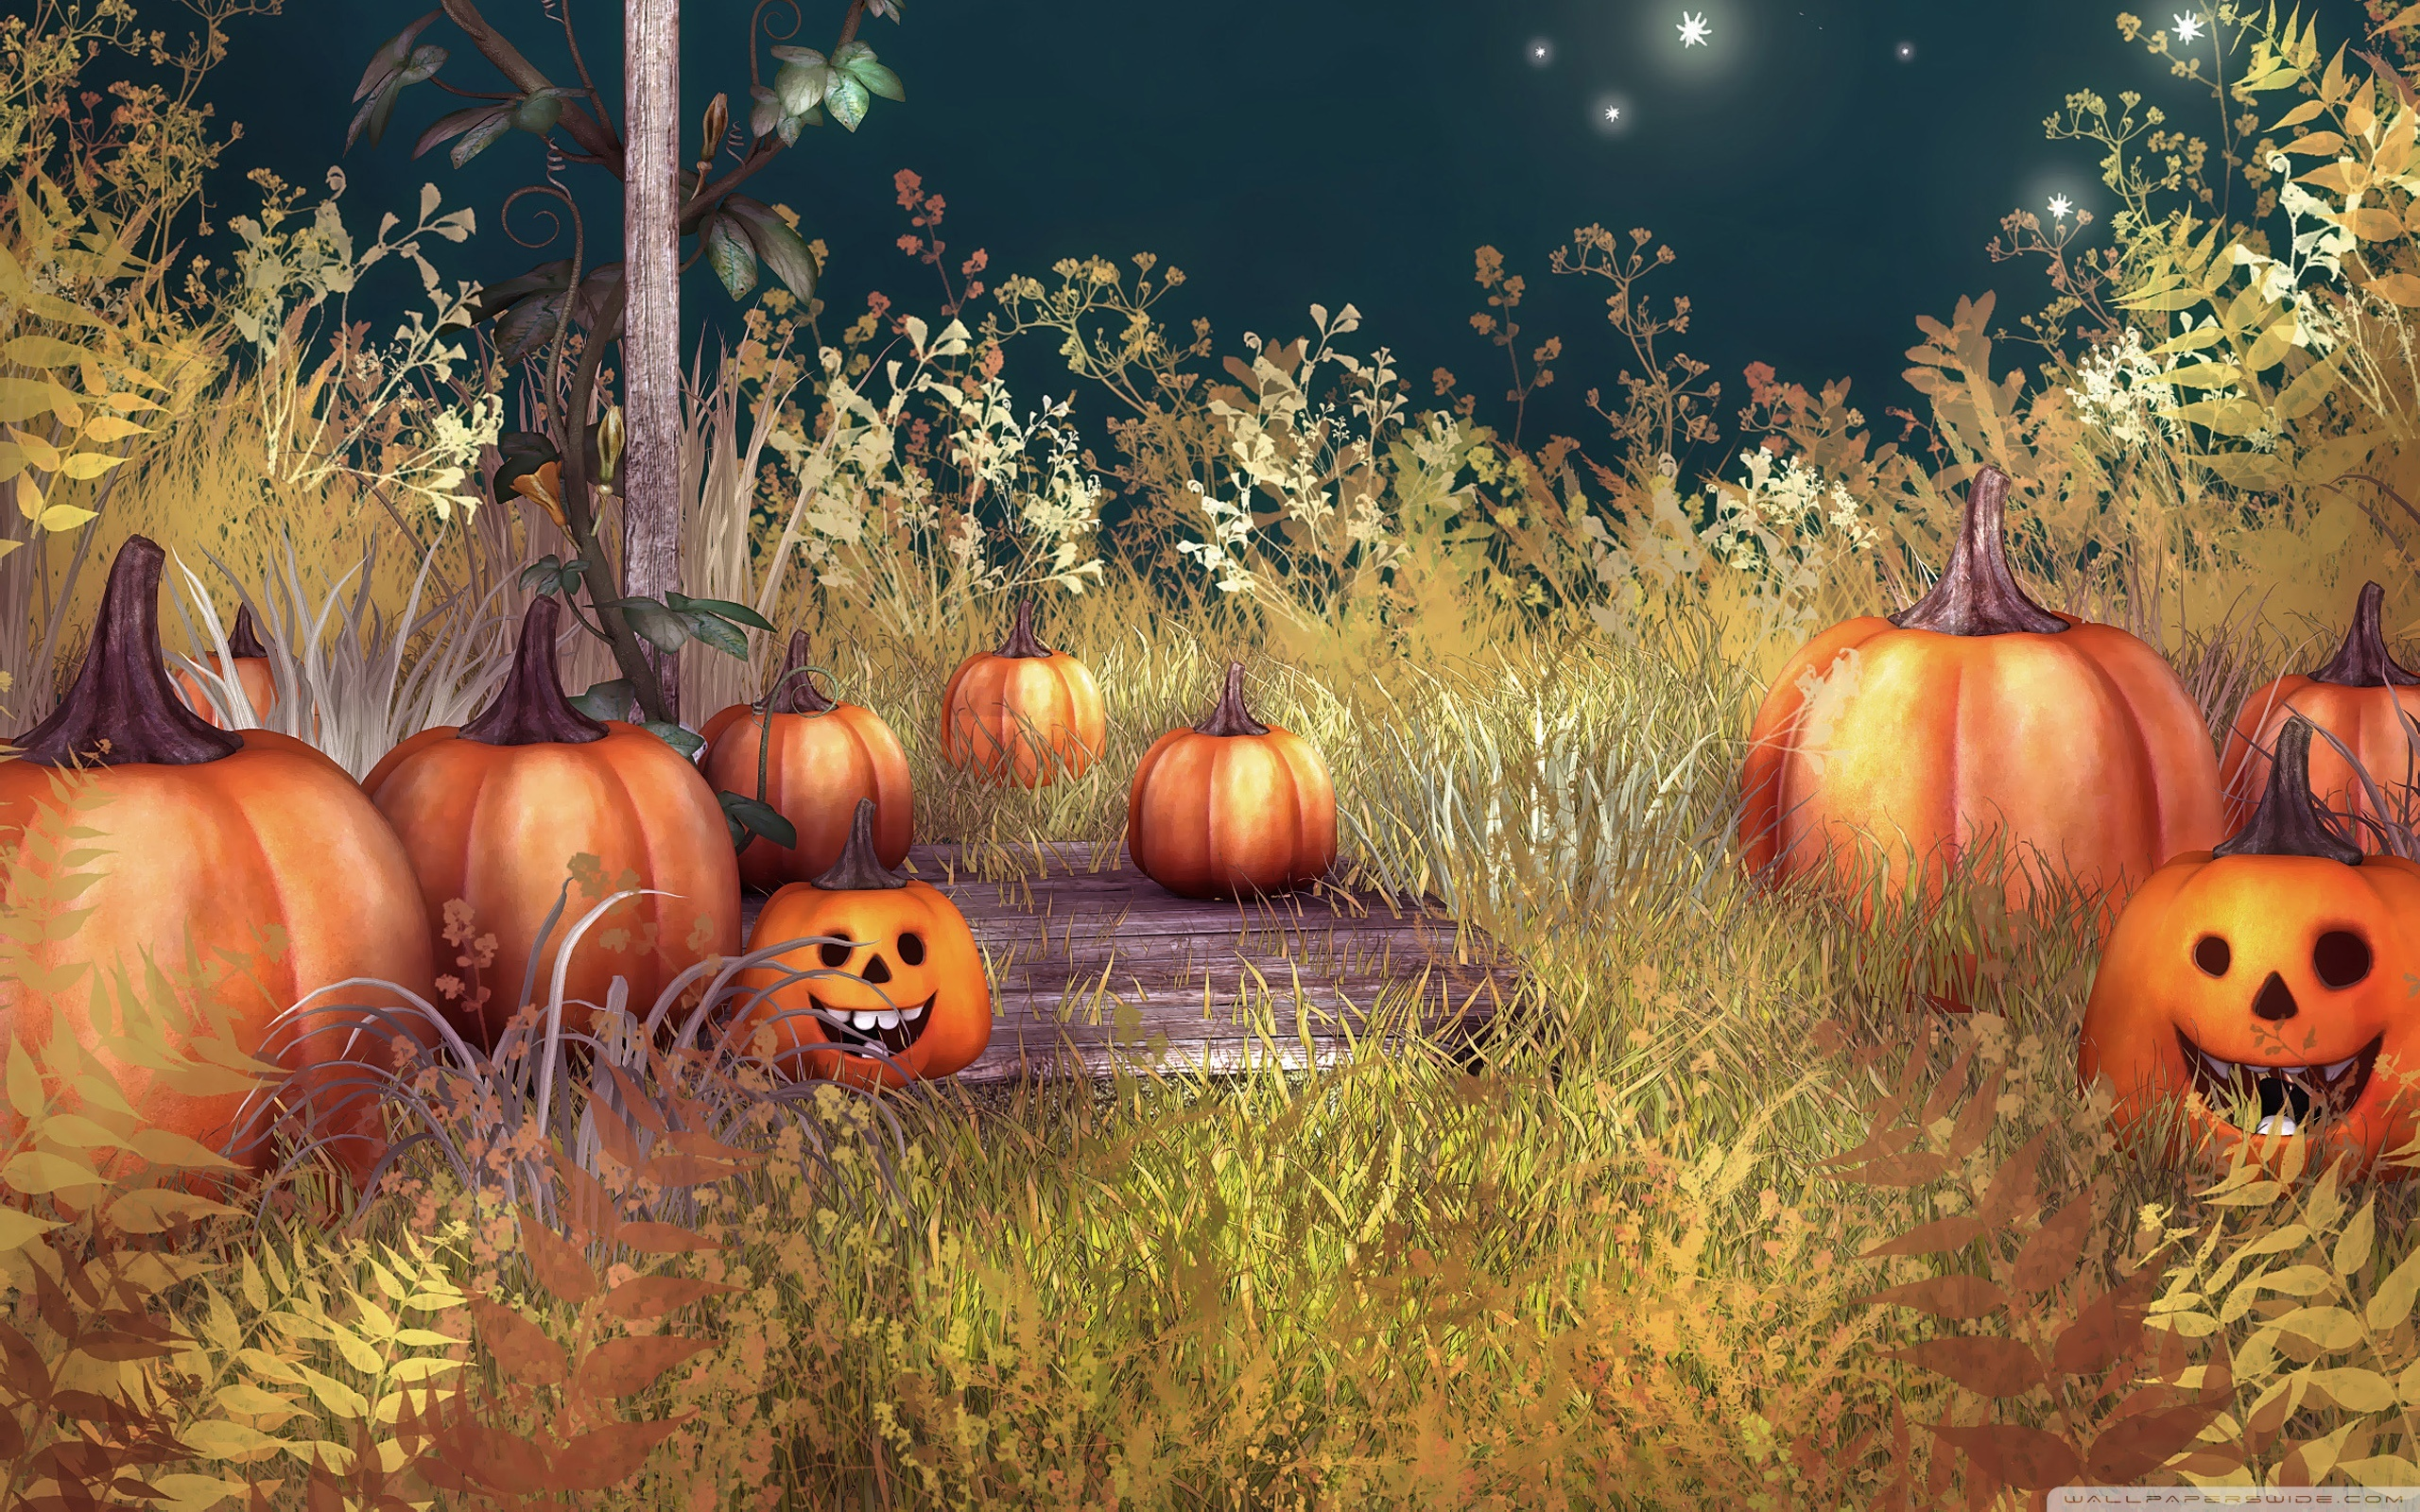 halloween_pumpkins-wallpaper-2560x1600-dusicky-obrazky-na-plochu